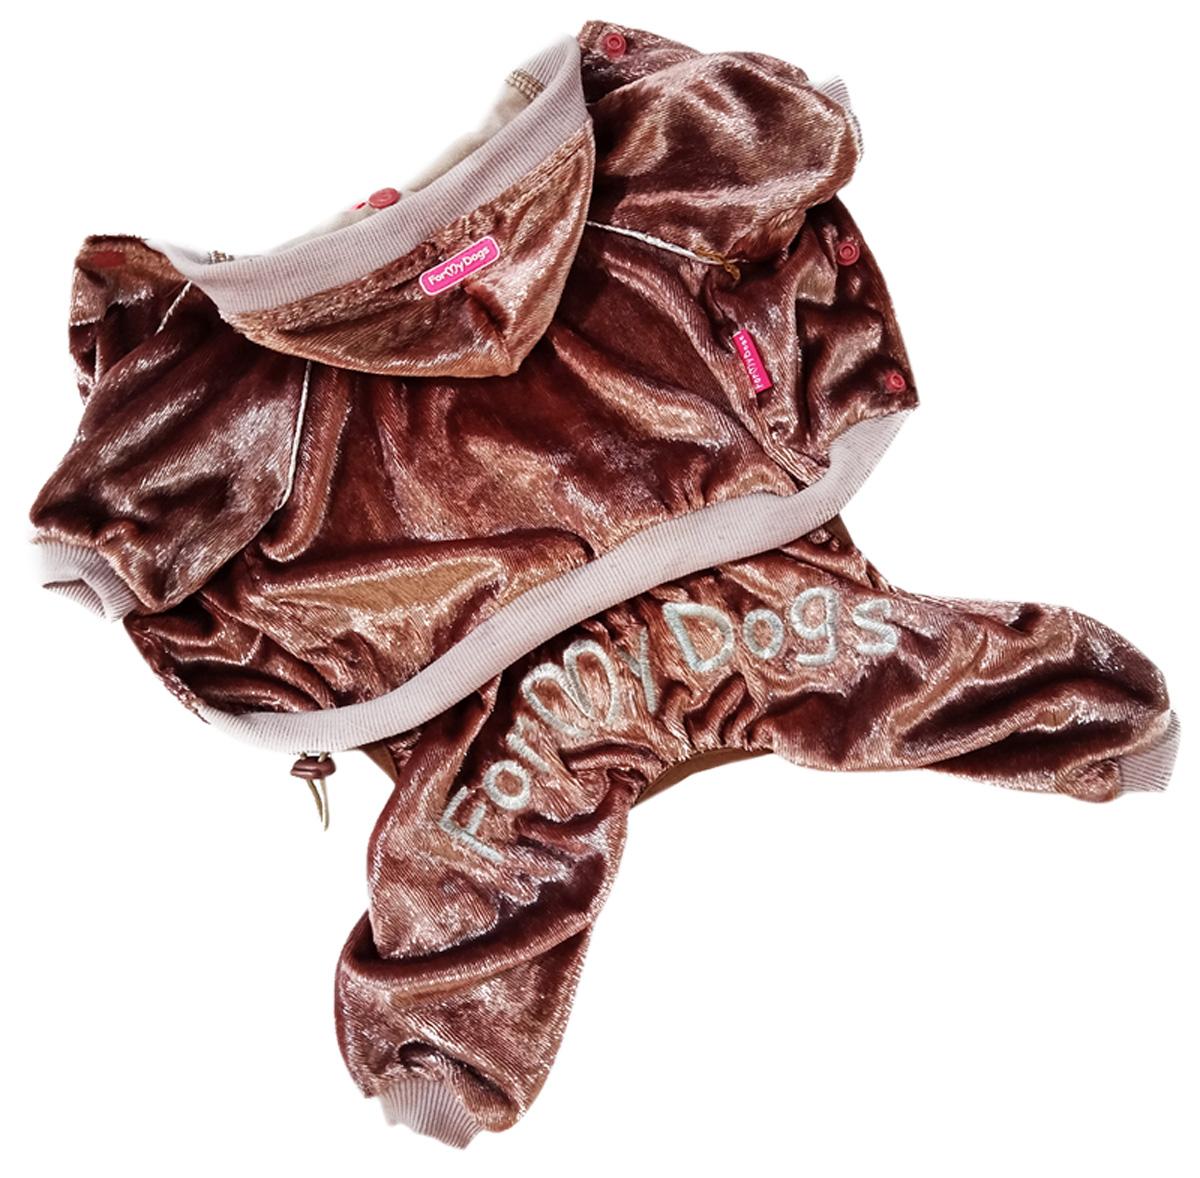 For My Dogs костюм для собак велюр коричневый 491ss-2020 Br (14)